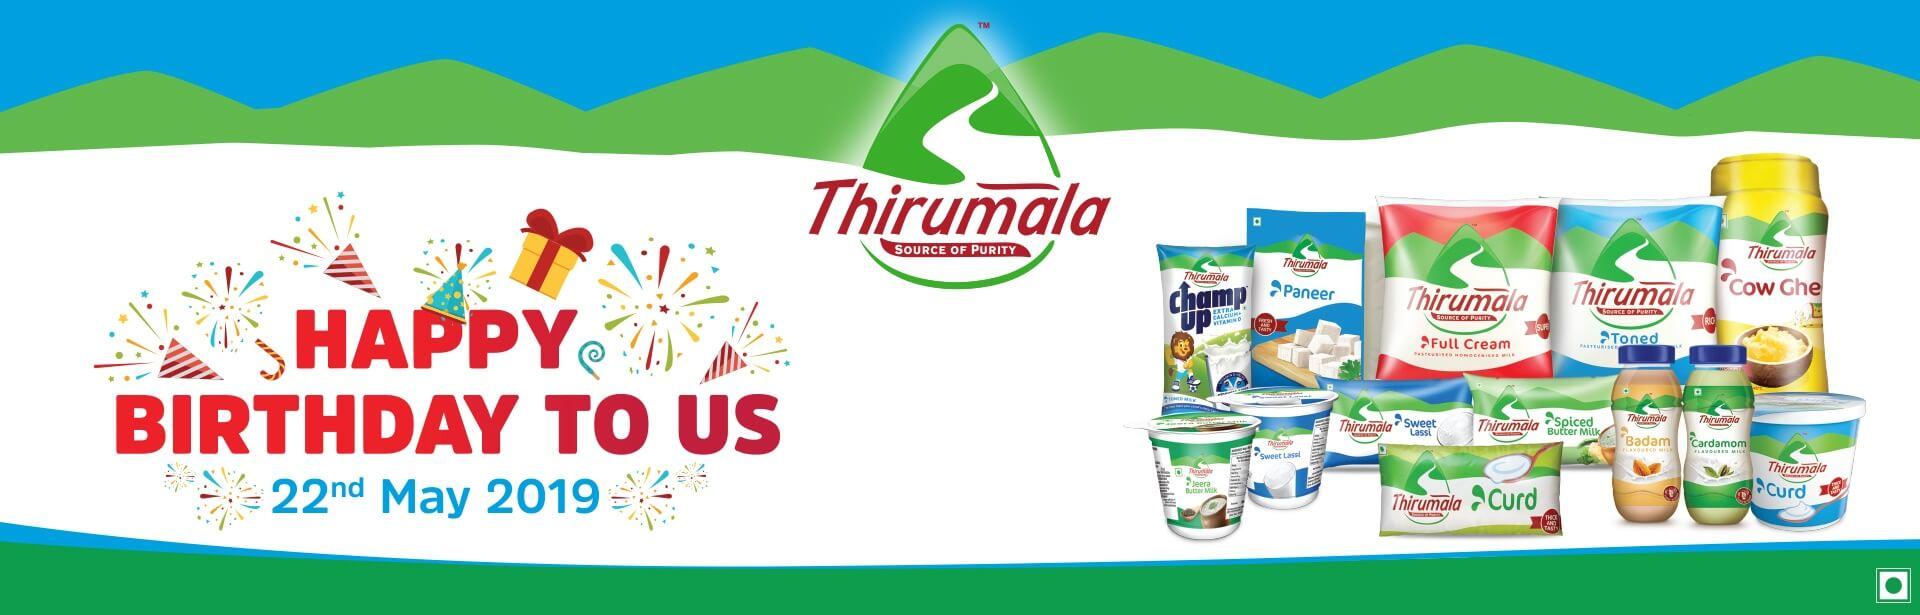 Thirumala